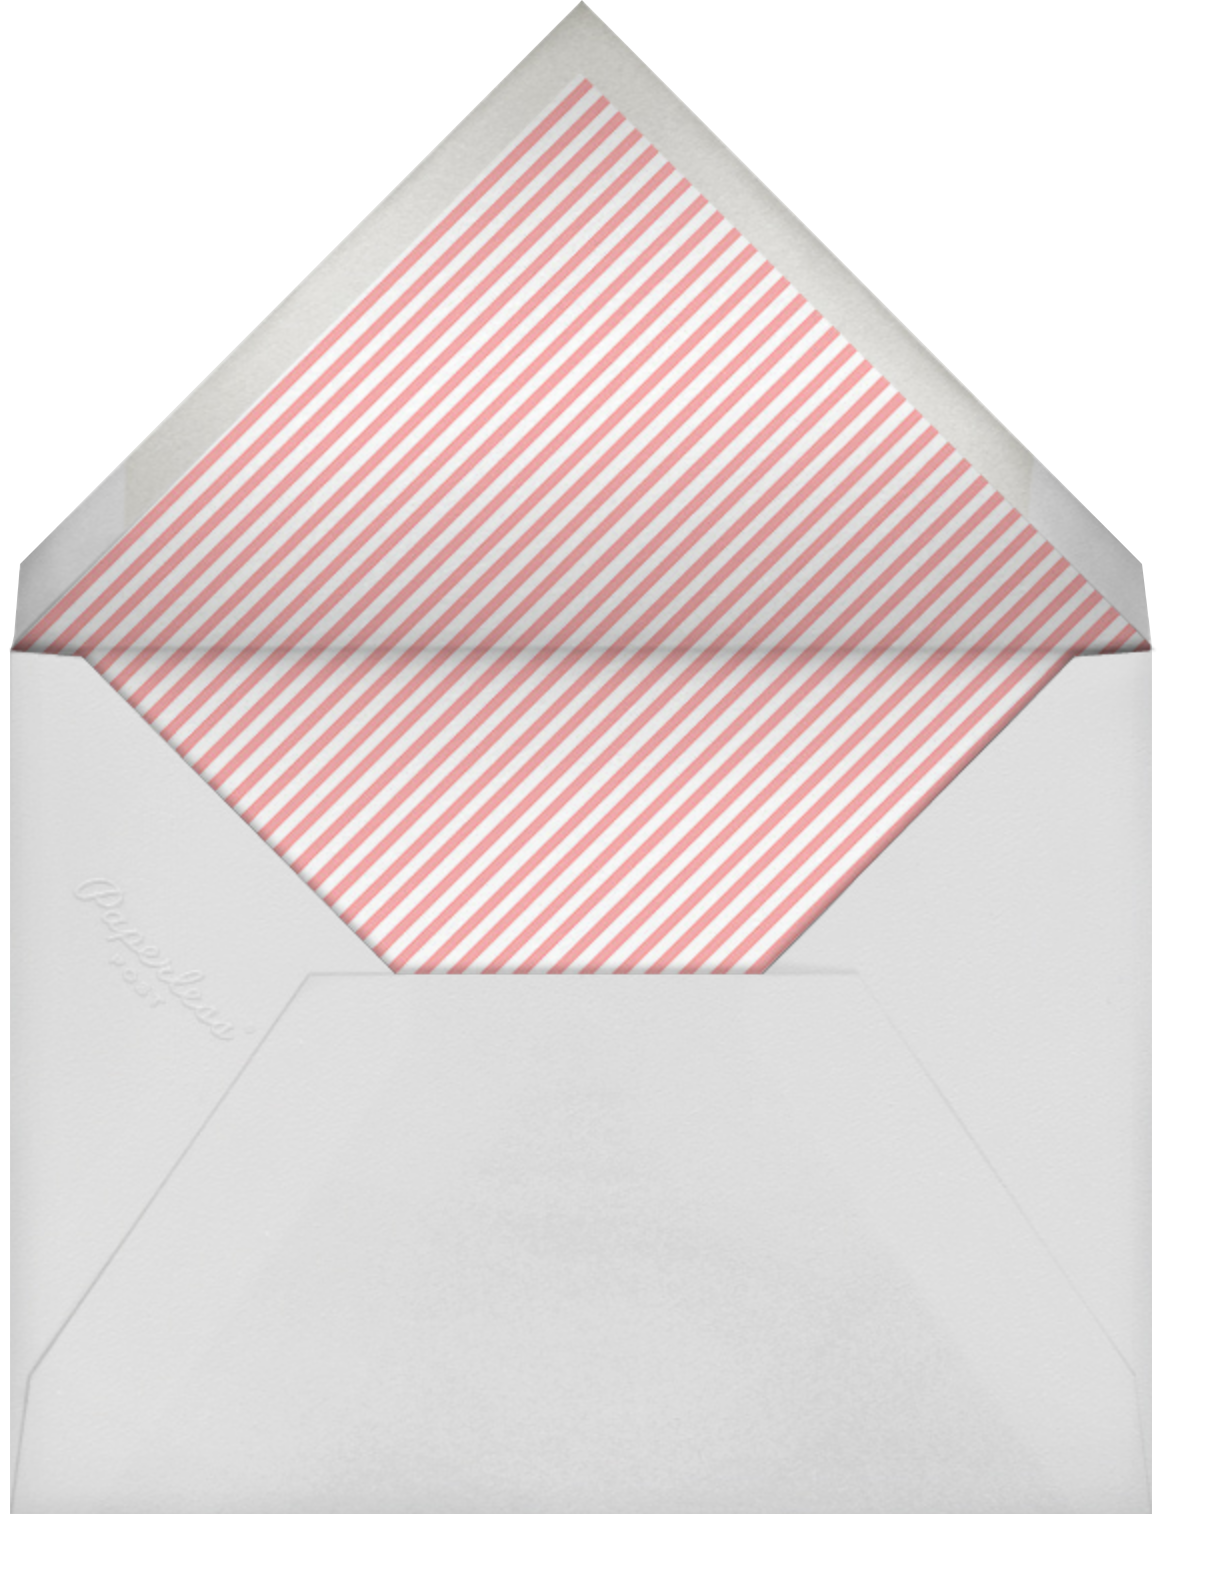 Hi Kittie - Green - Mr. Boddington's Studio - Just because - envelope back